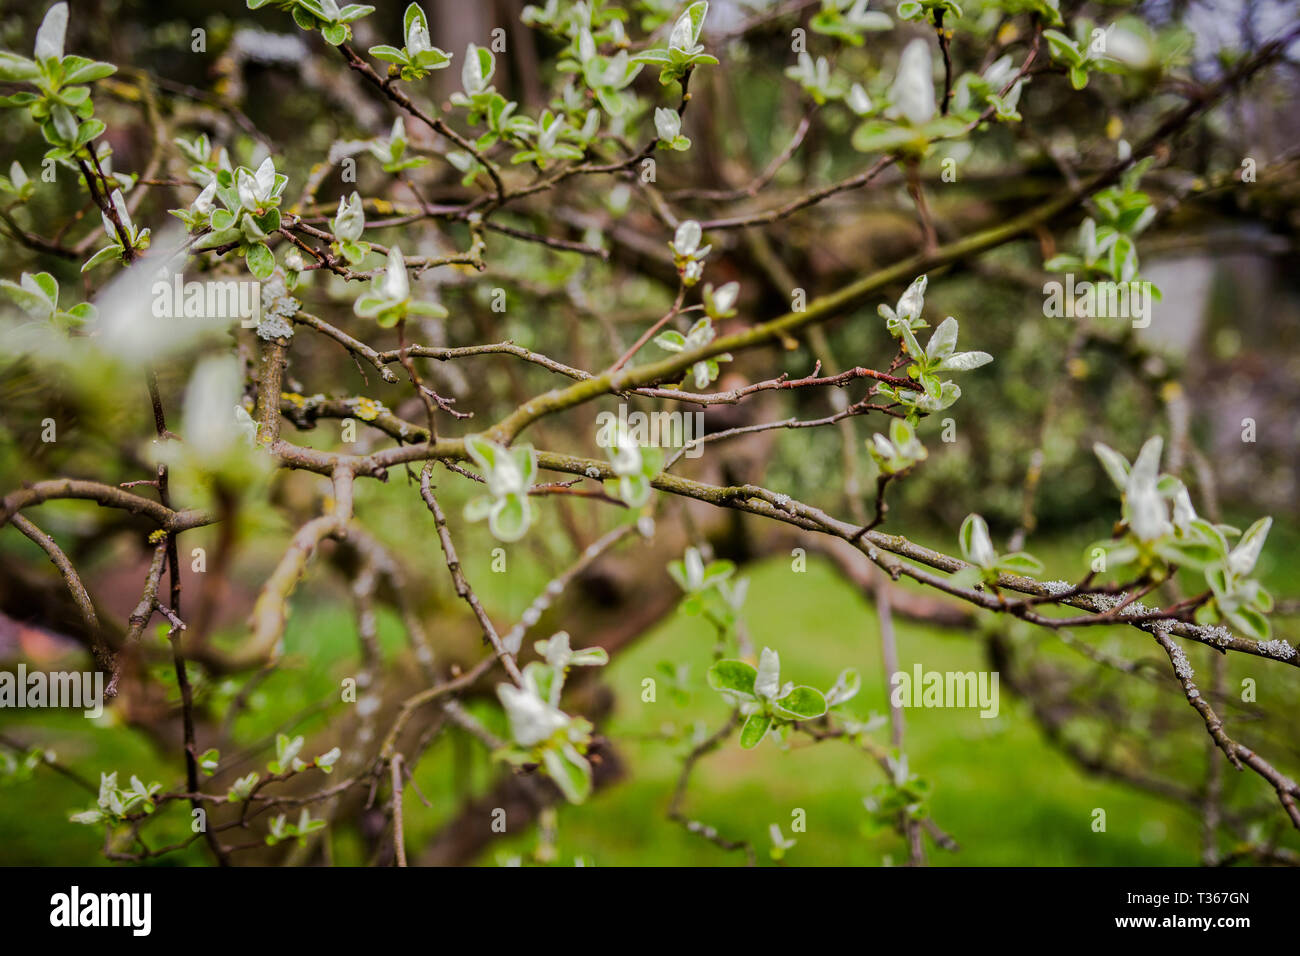 Die Quitte in ihrer Blüte; quince is flowering - Stock Image